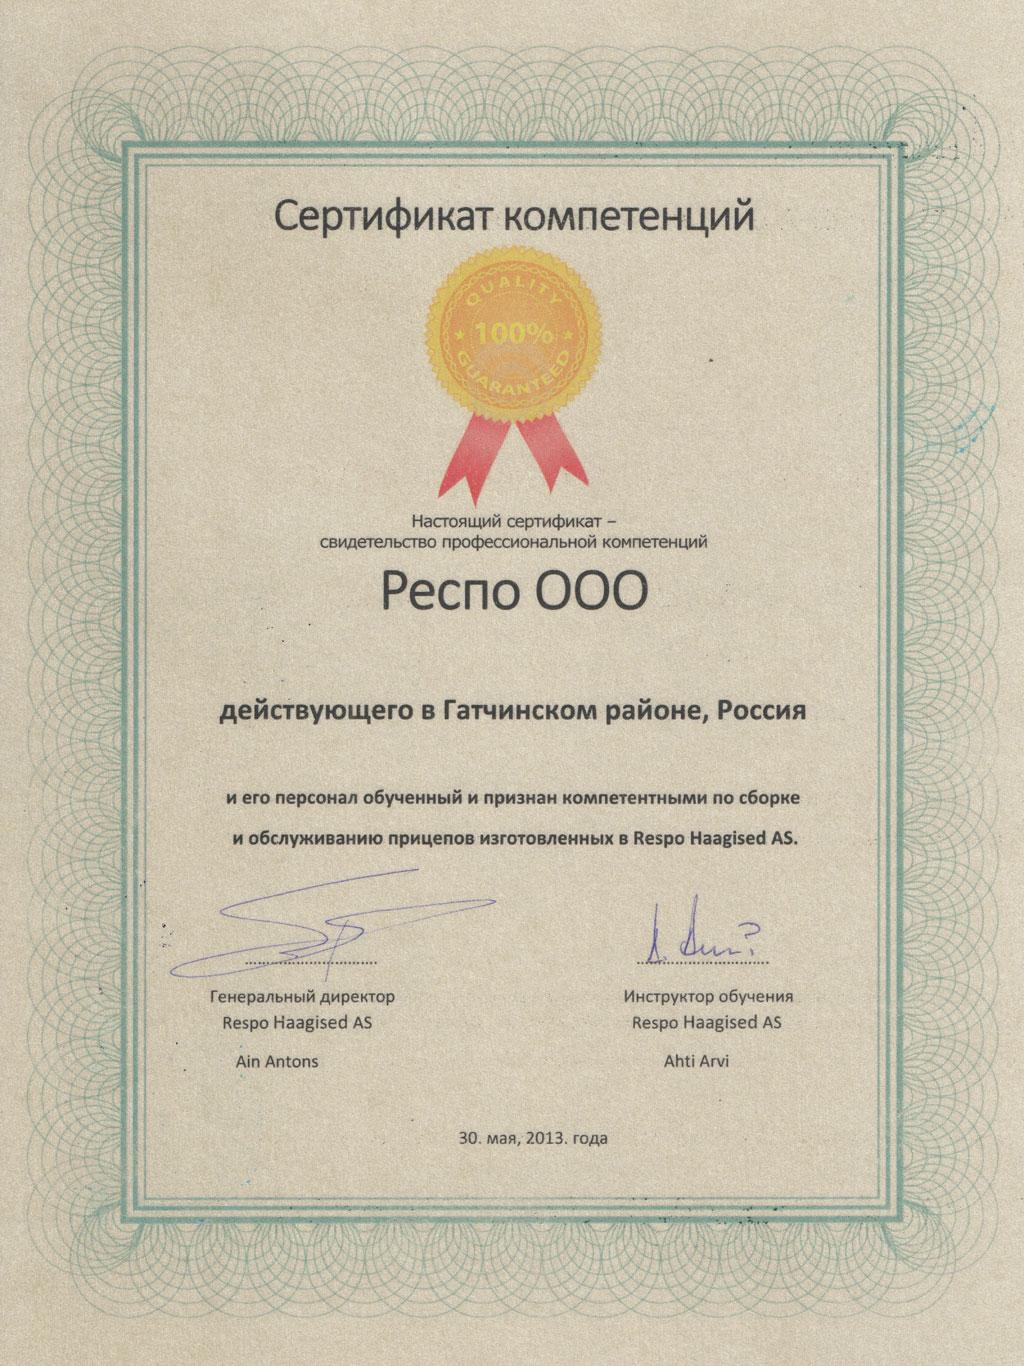 Сертификат компетенций